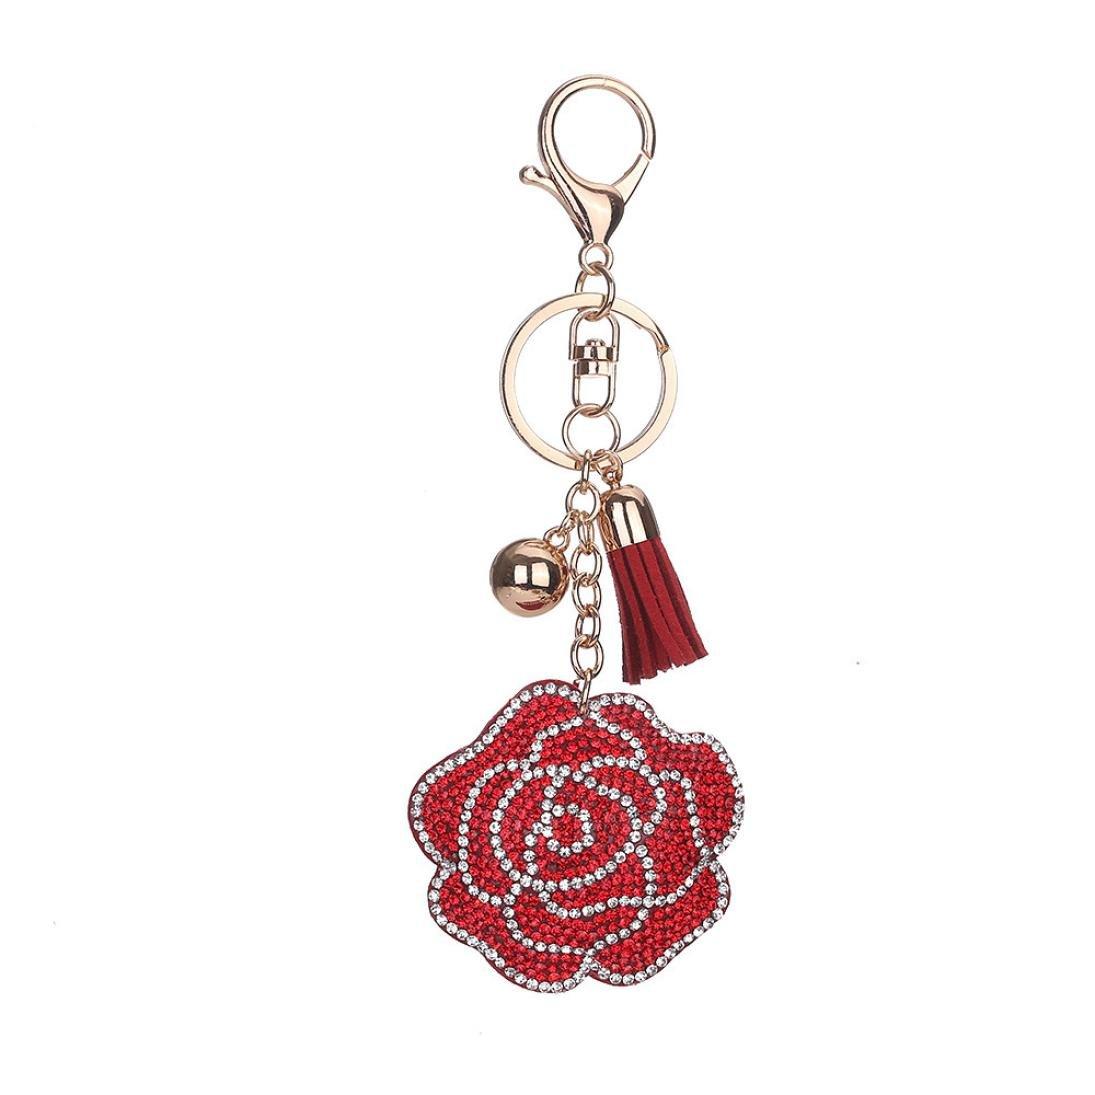 BCDshop Roses Keychain Rhinestone Tassel Key Chain Car Key Bag Handbag Key Ring Pendant Charm Gift (White) LL-123